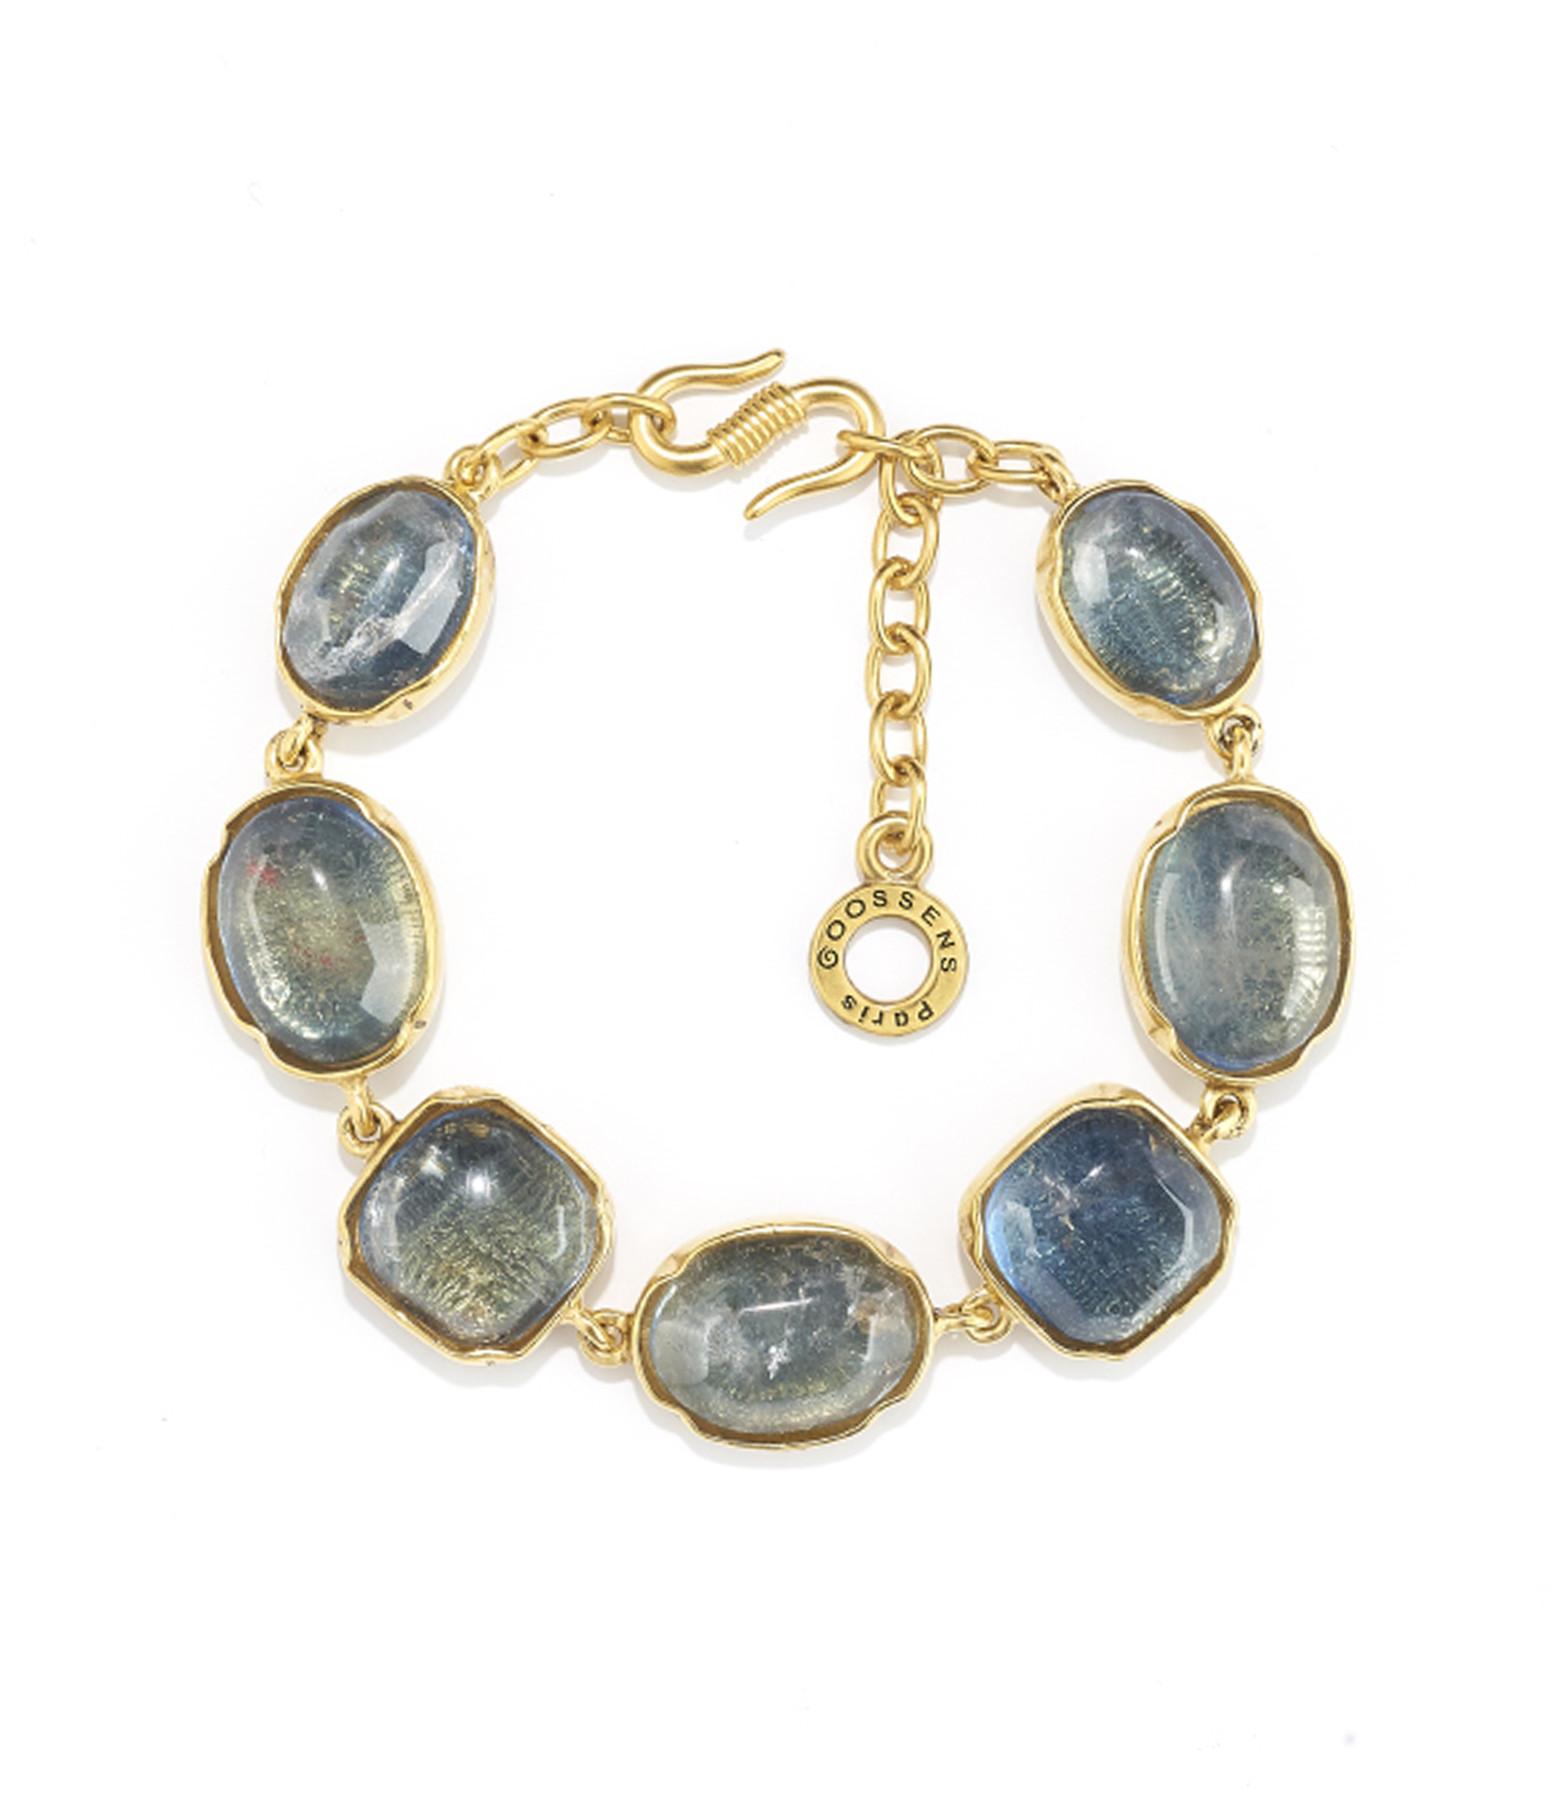 GOOSSENS - Bracelet Cabochons Bleu Denim